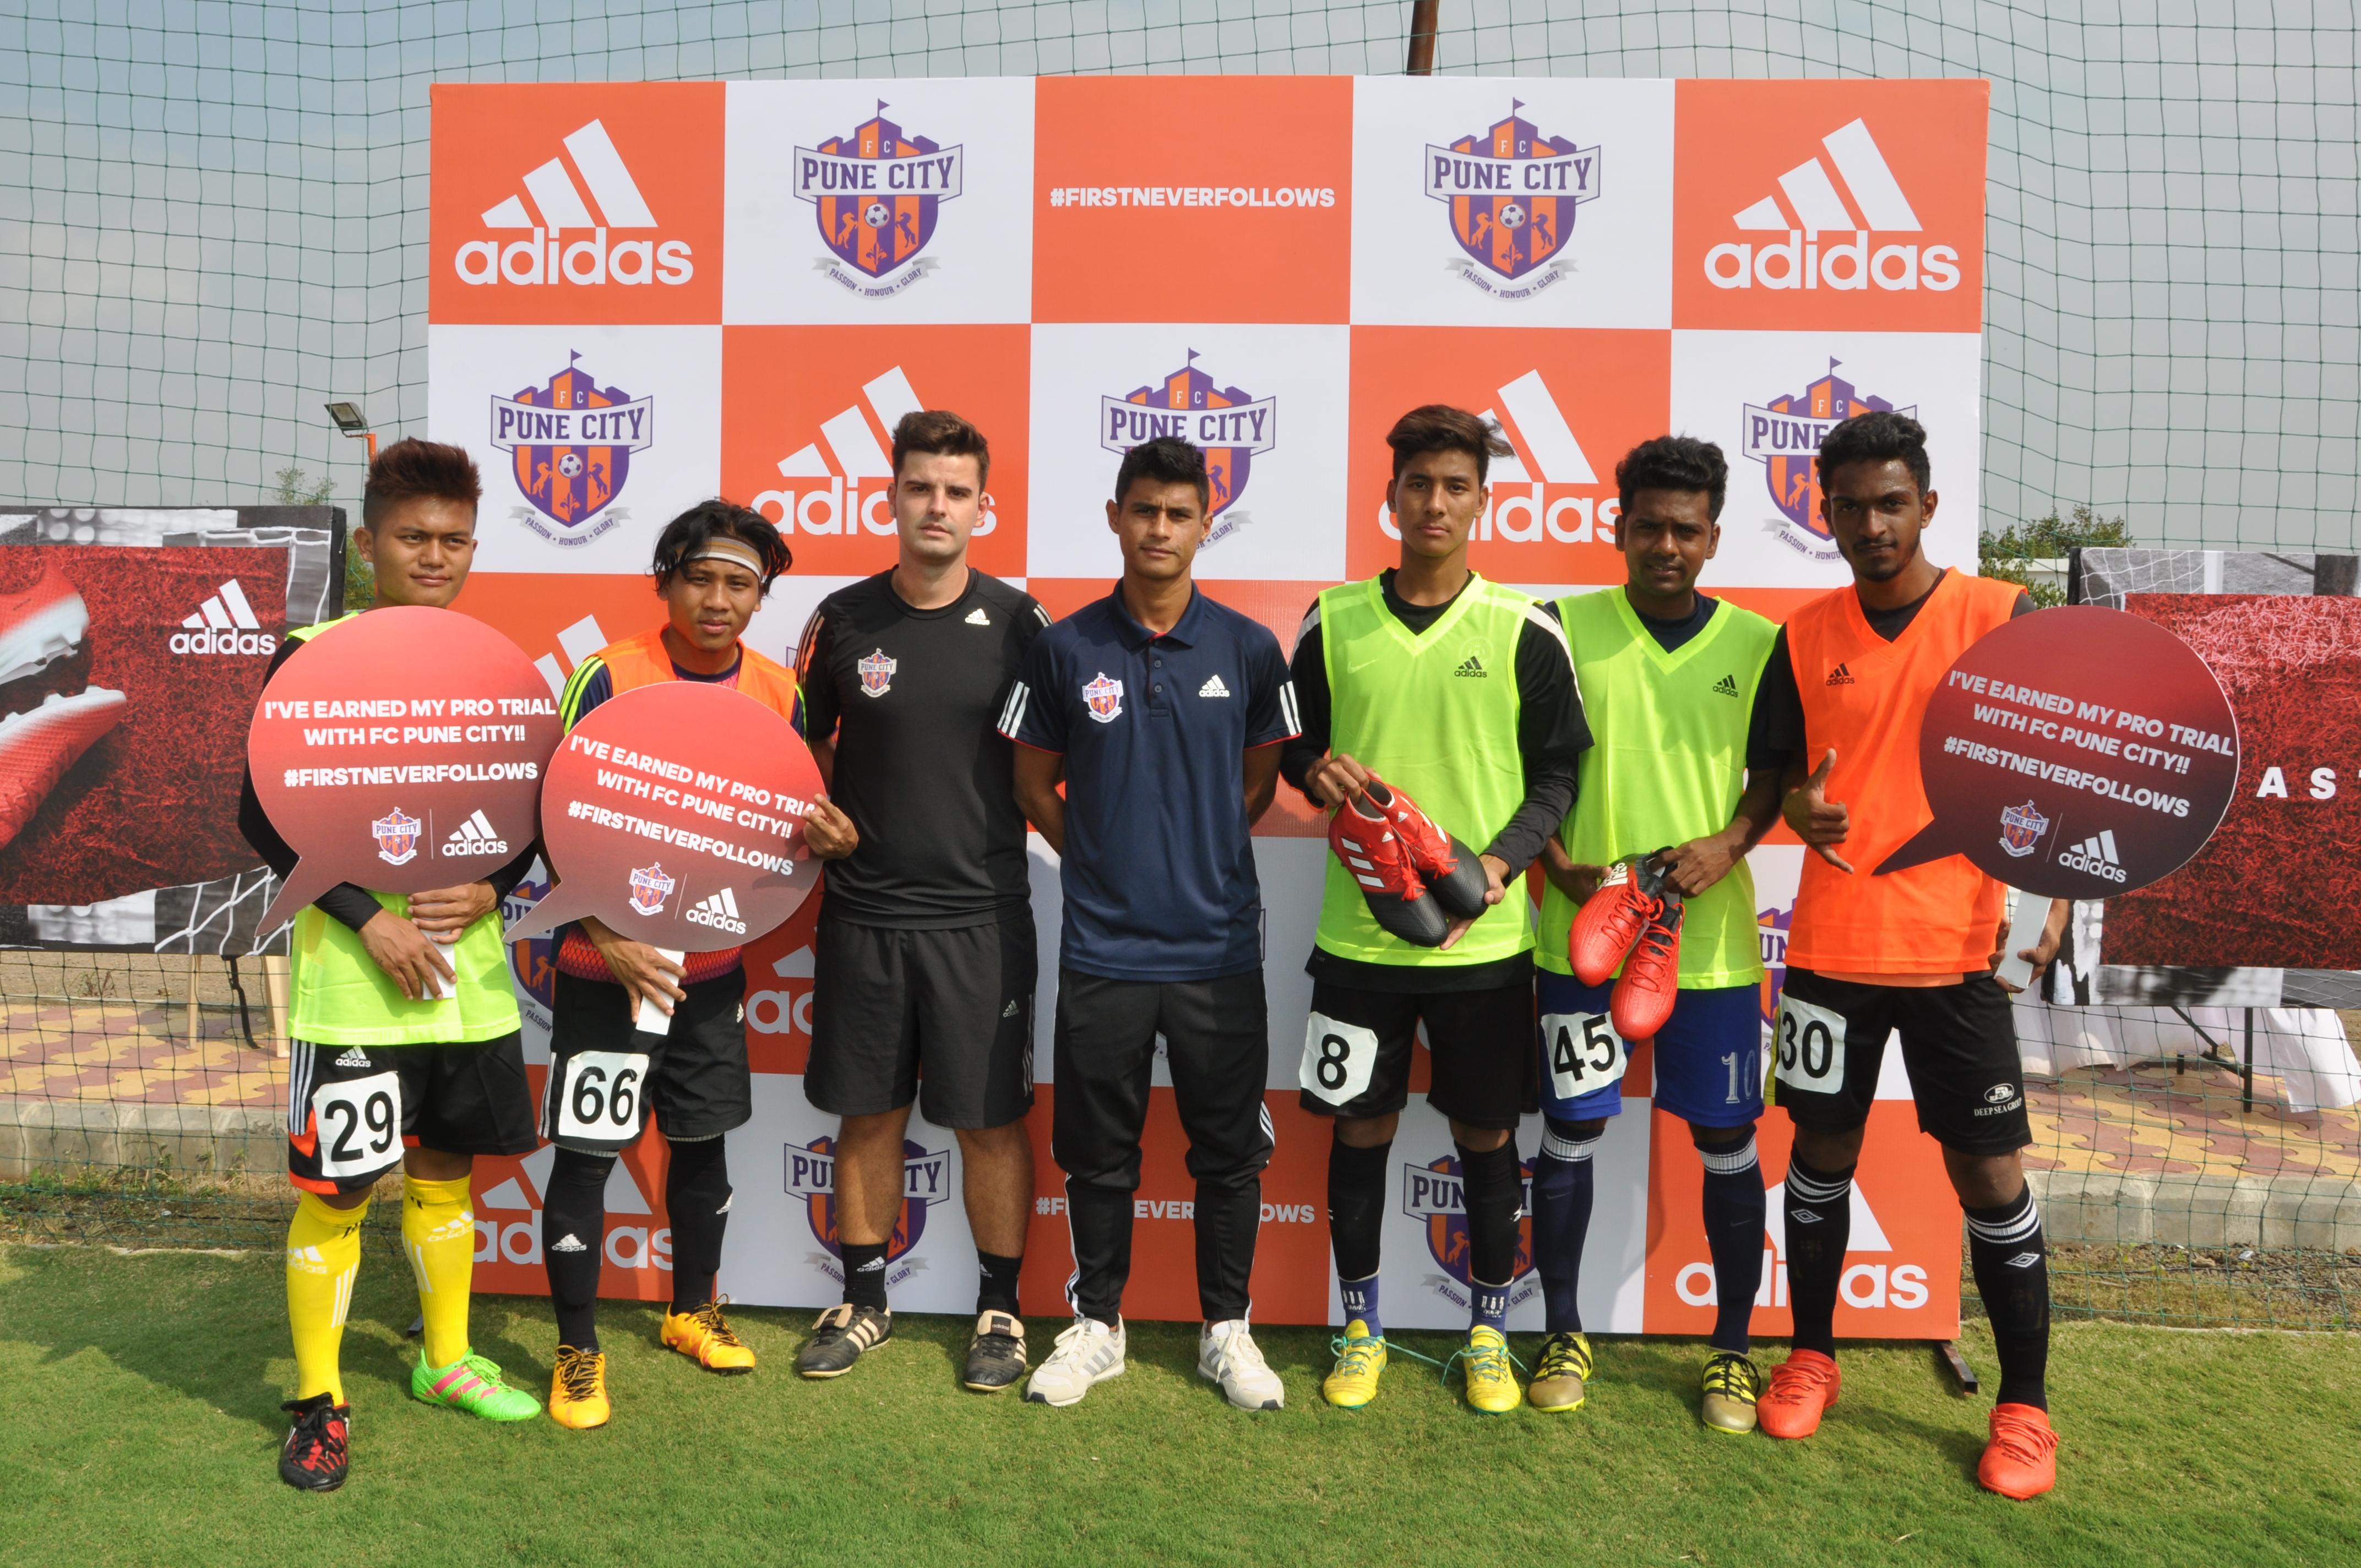 Adidas FC Pune City